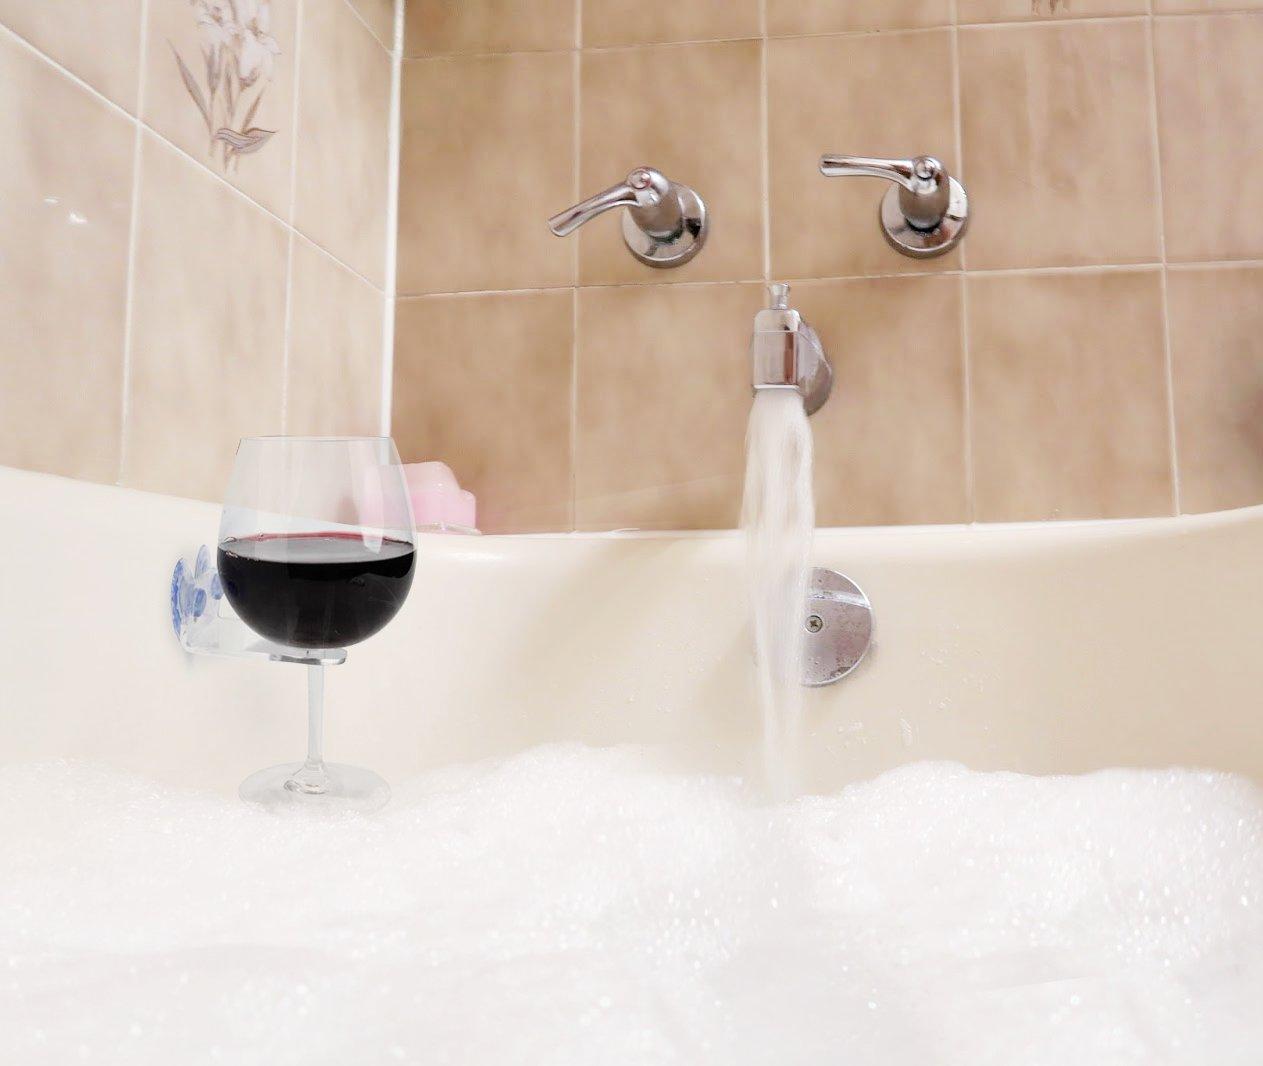 Bathtub Wine Glass Cupholder. Caddy Shower & Relax Bath With ...